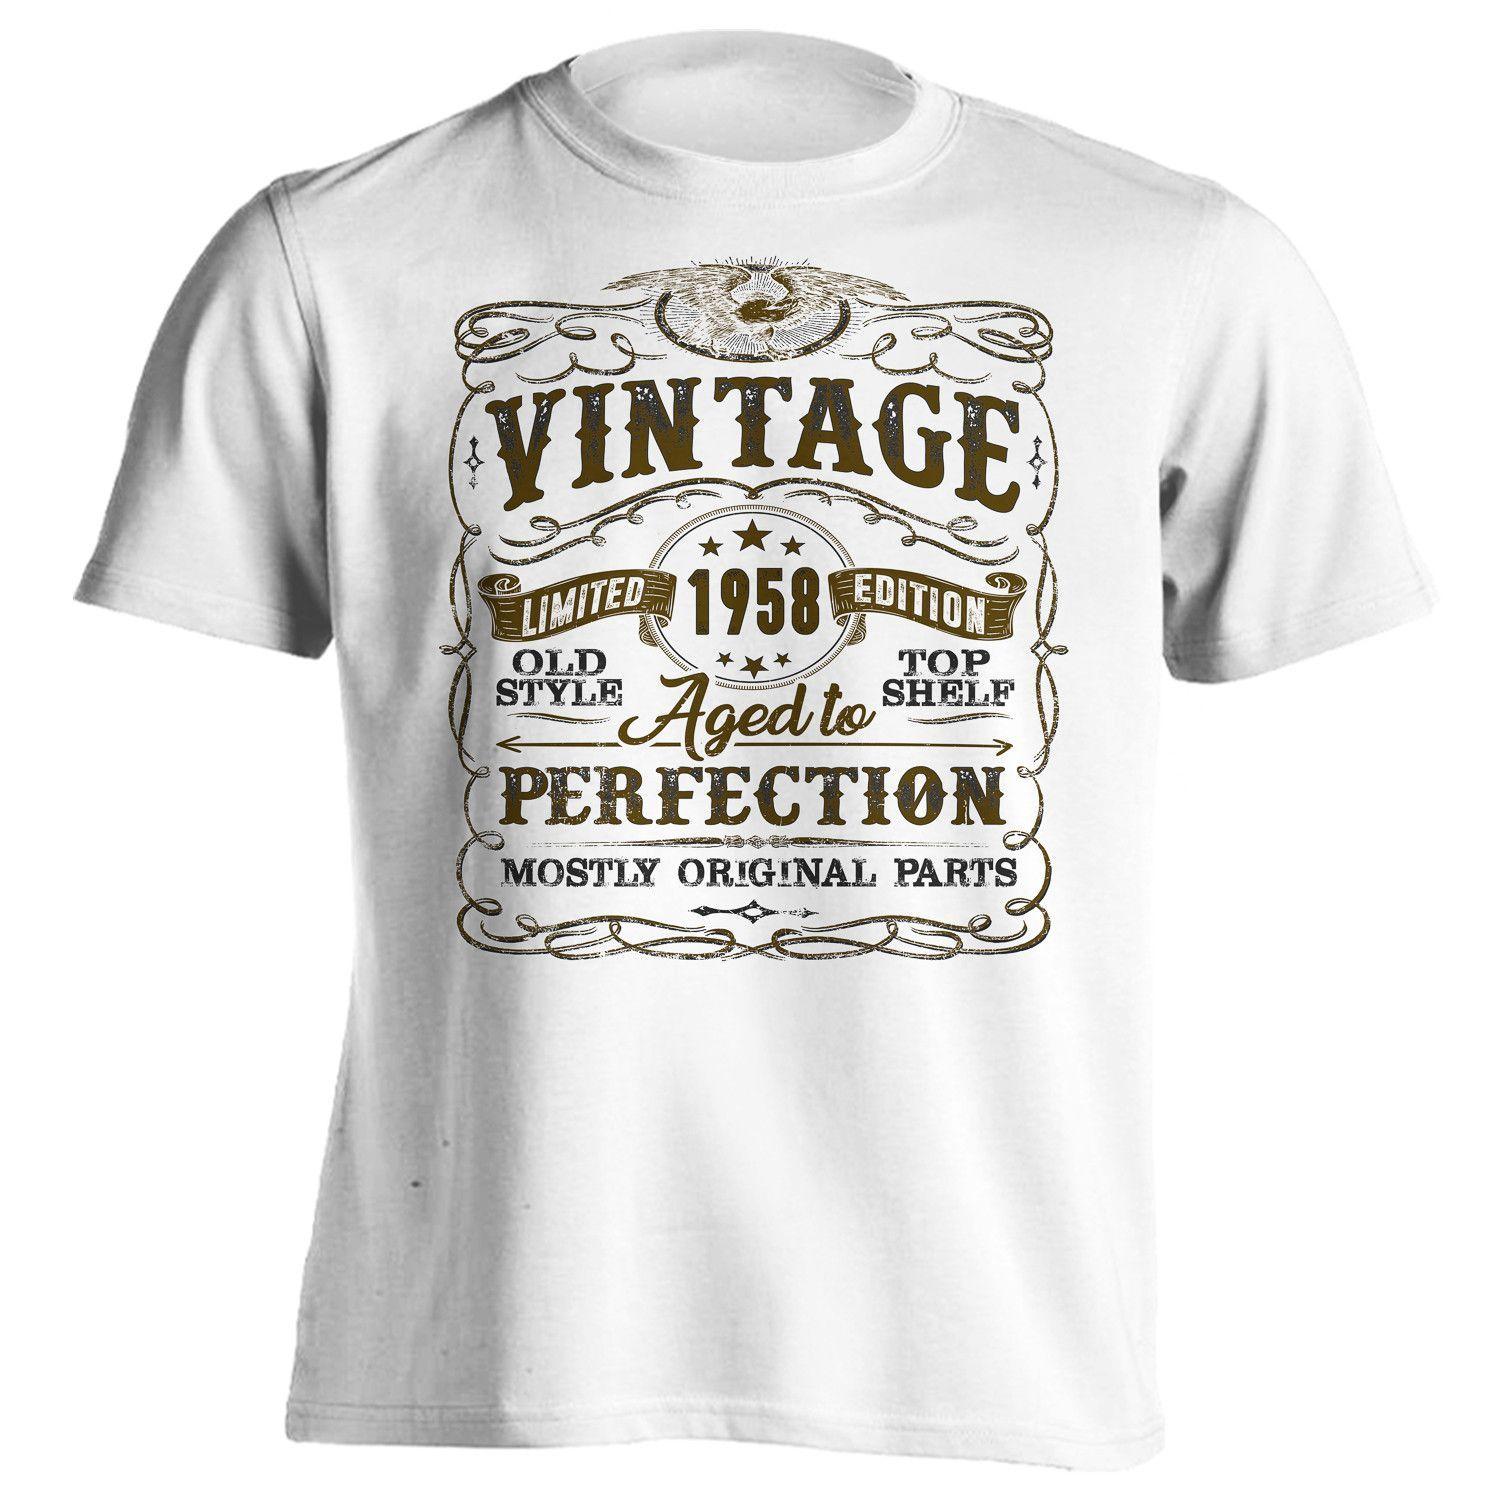 59th Birthday Shirt Vintage Mostly Original Parts